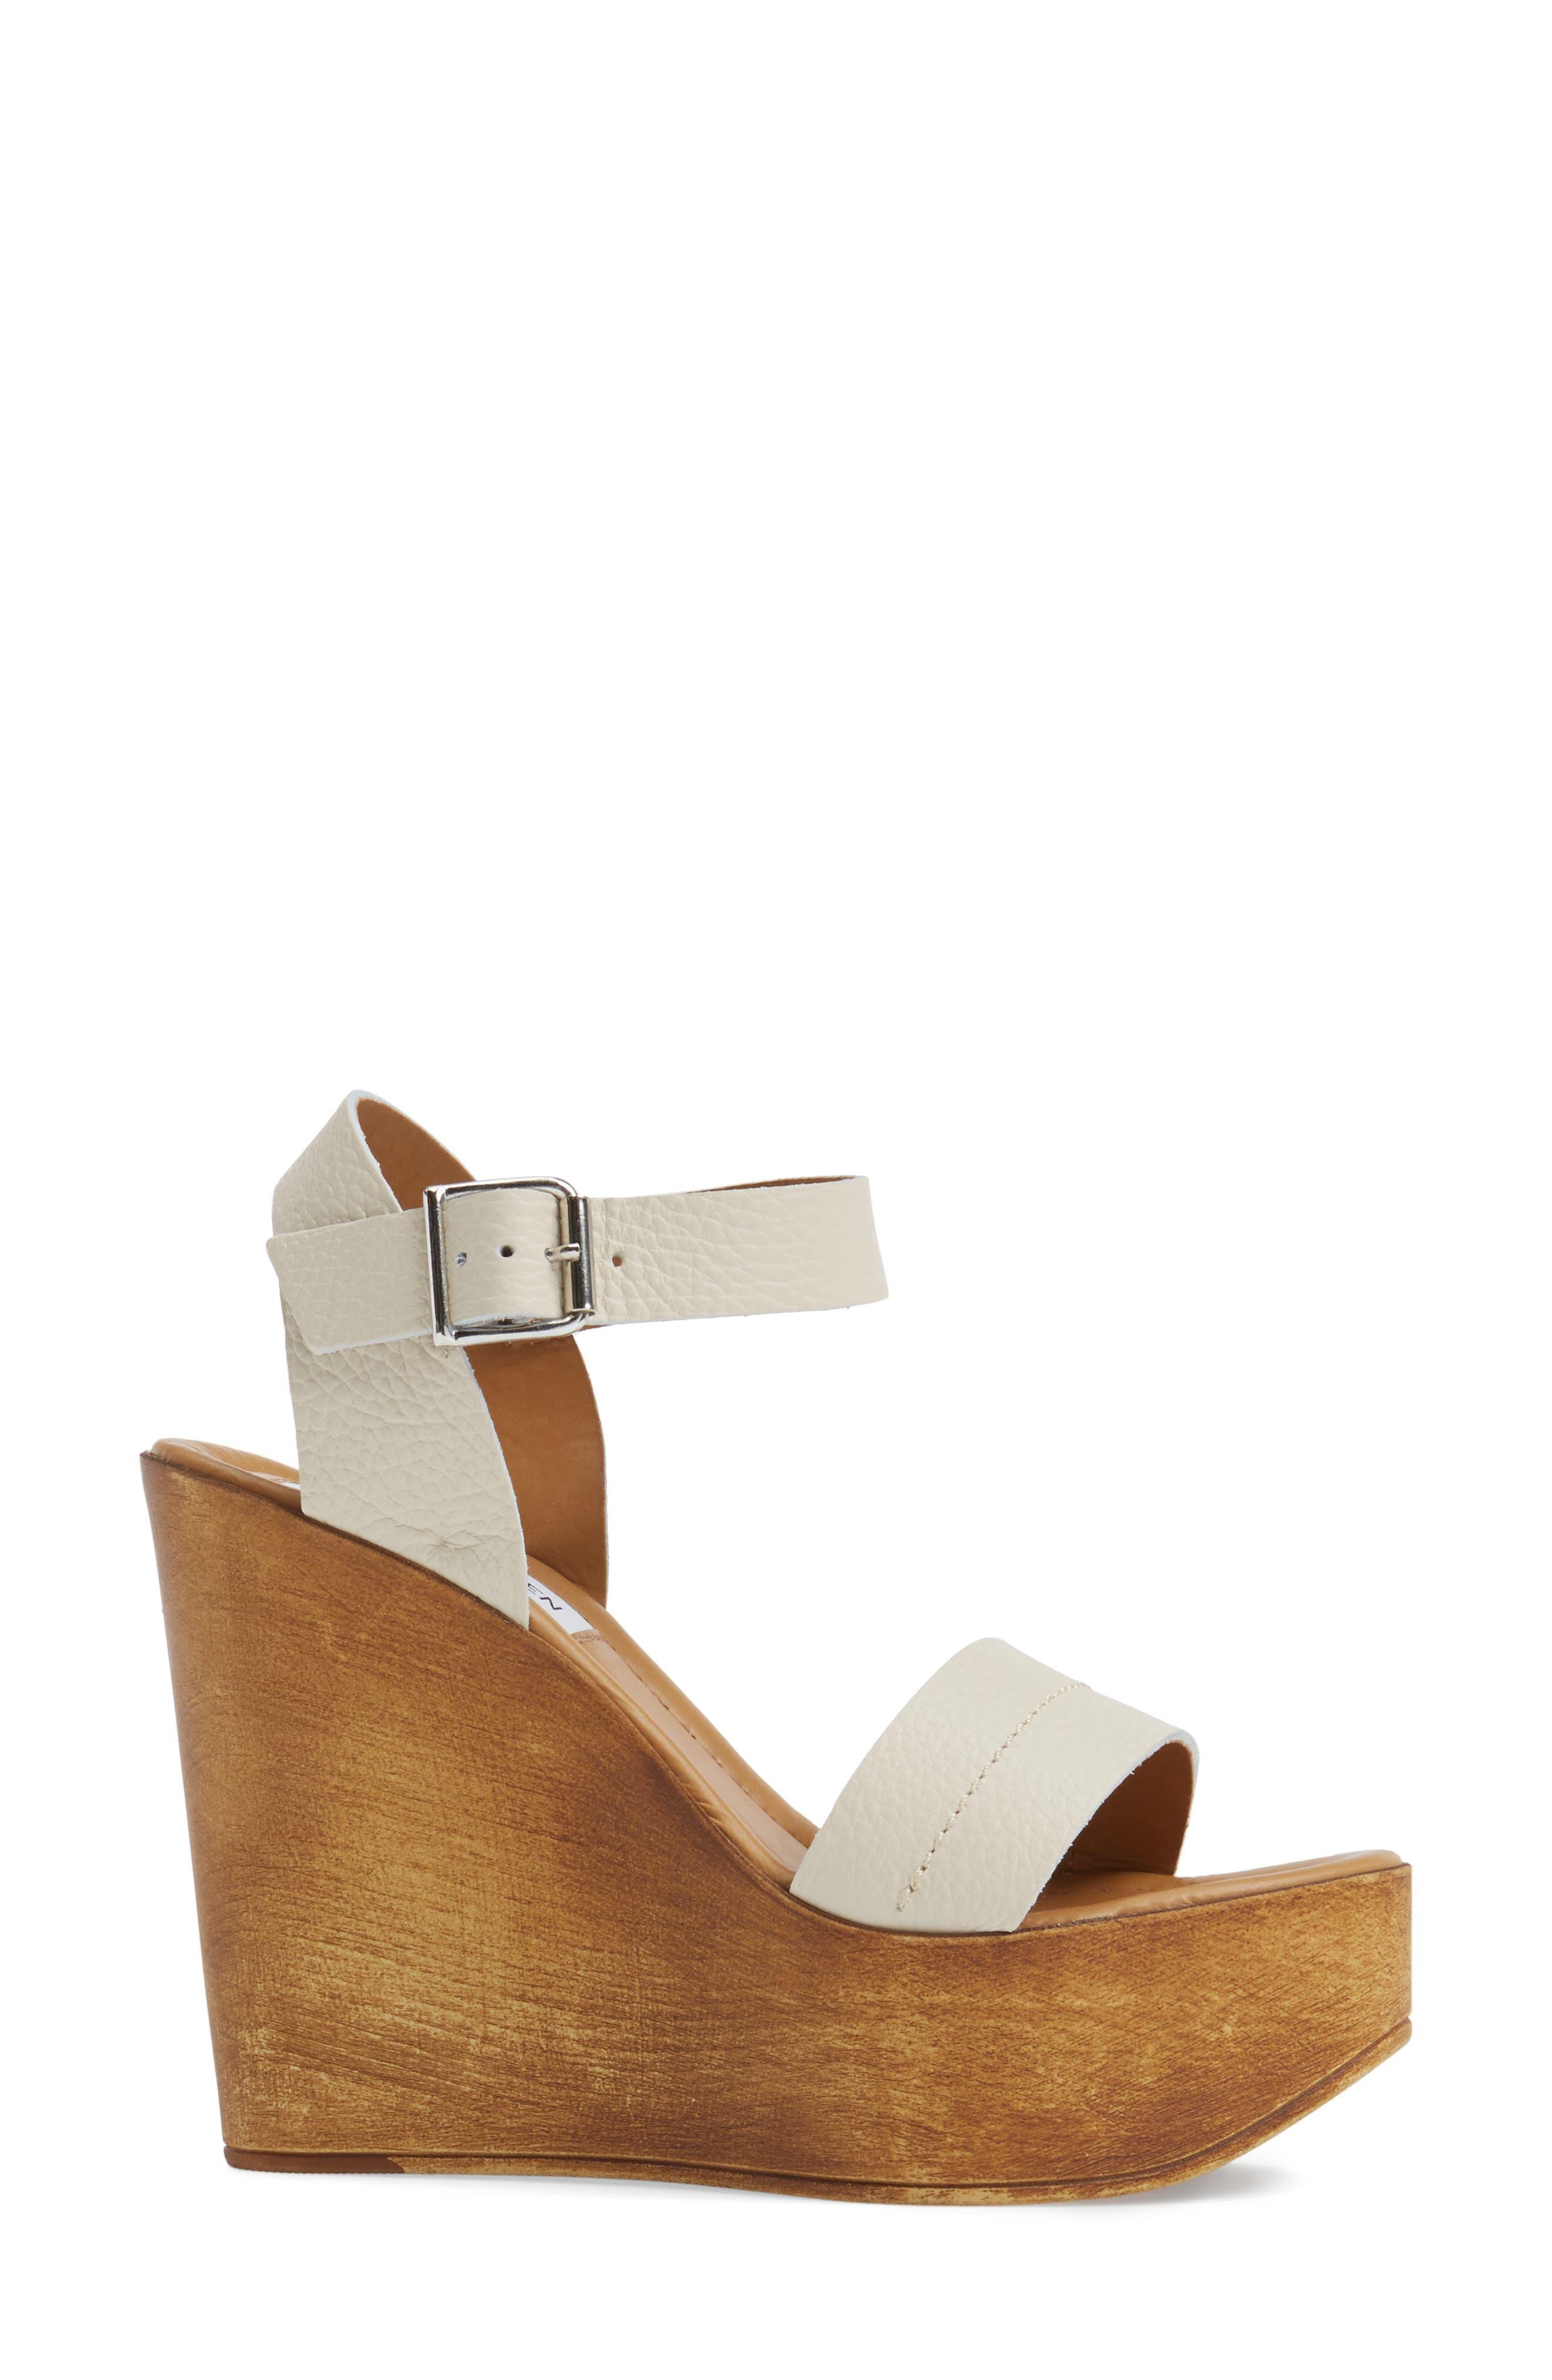 Belma Wedge Sandal,                             Alternate thumbnail 8, color,